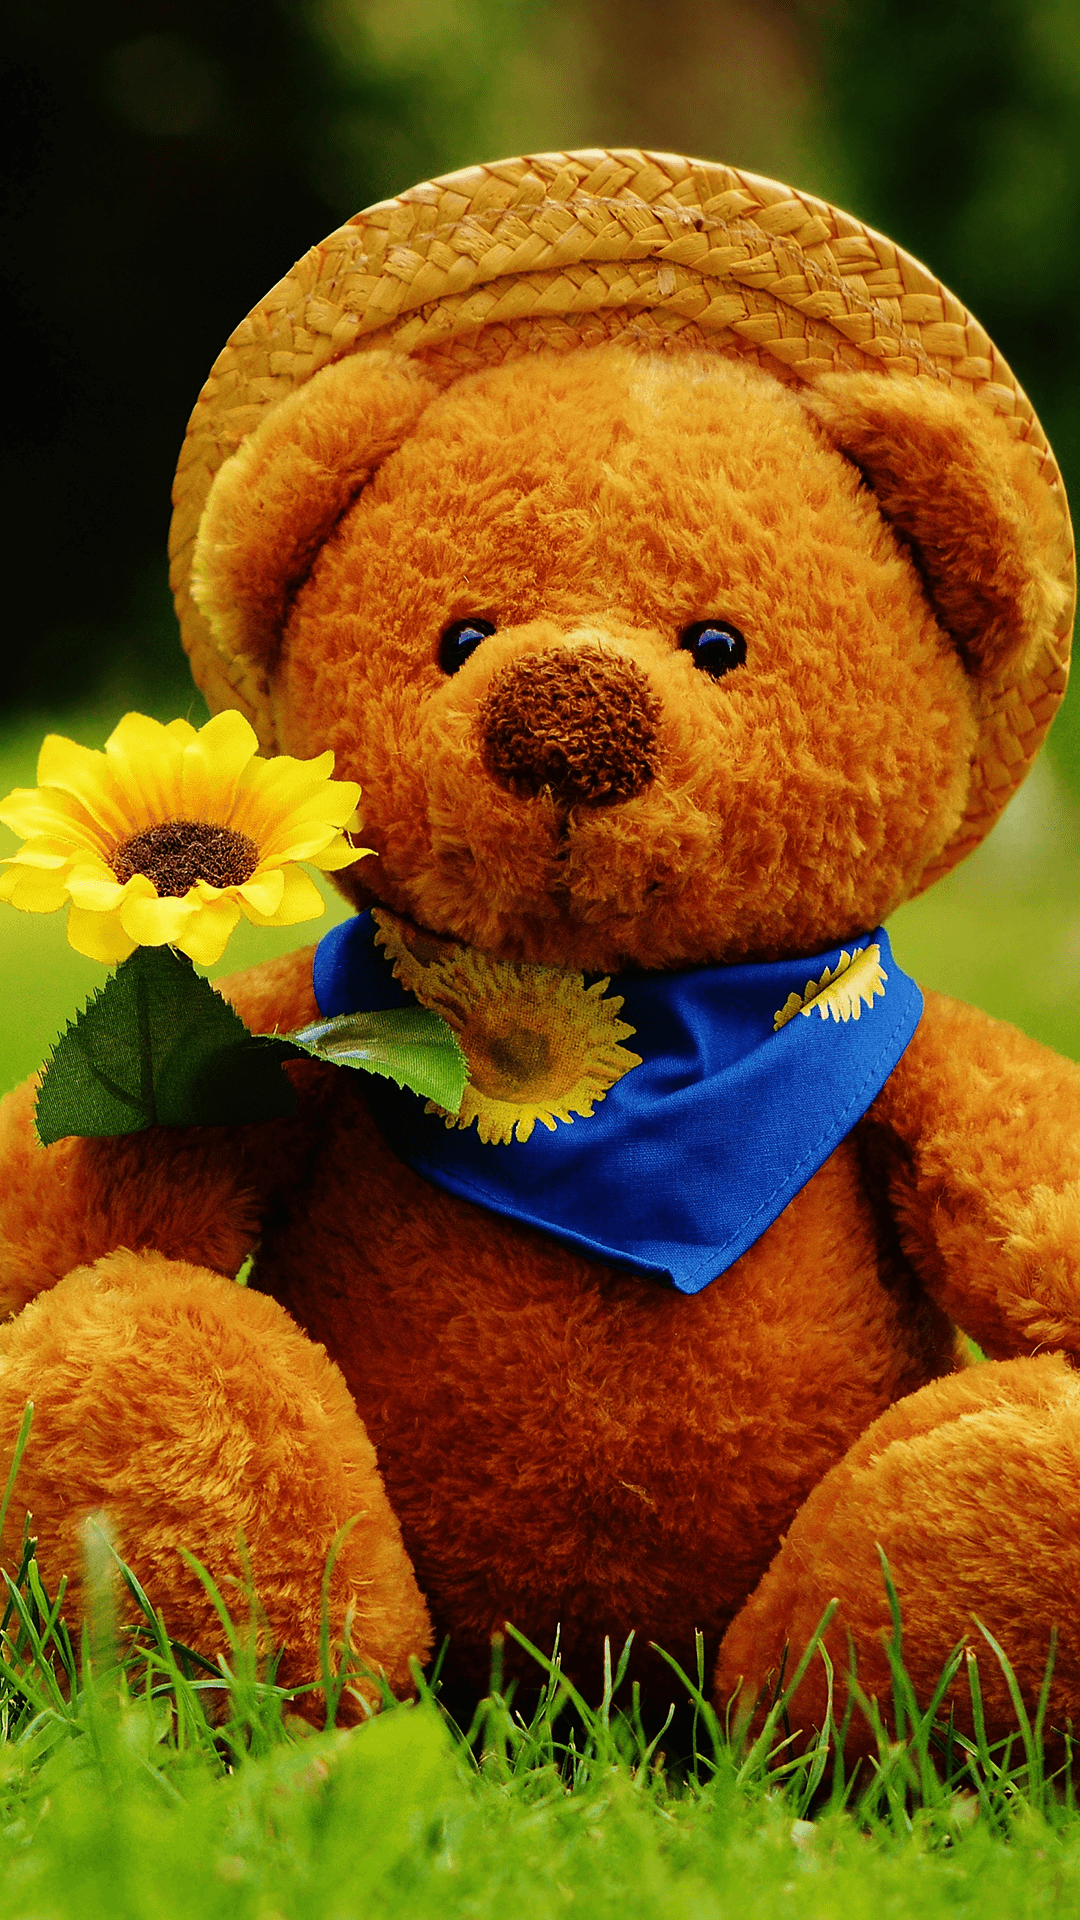 28 best free teddy bear iphone wallpapers wallpaperaccess 744x1392 izmirmasajfo